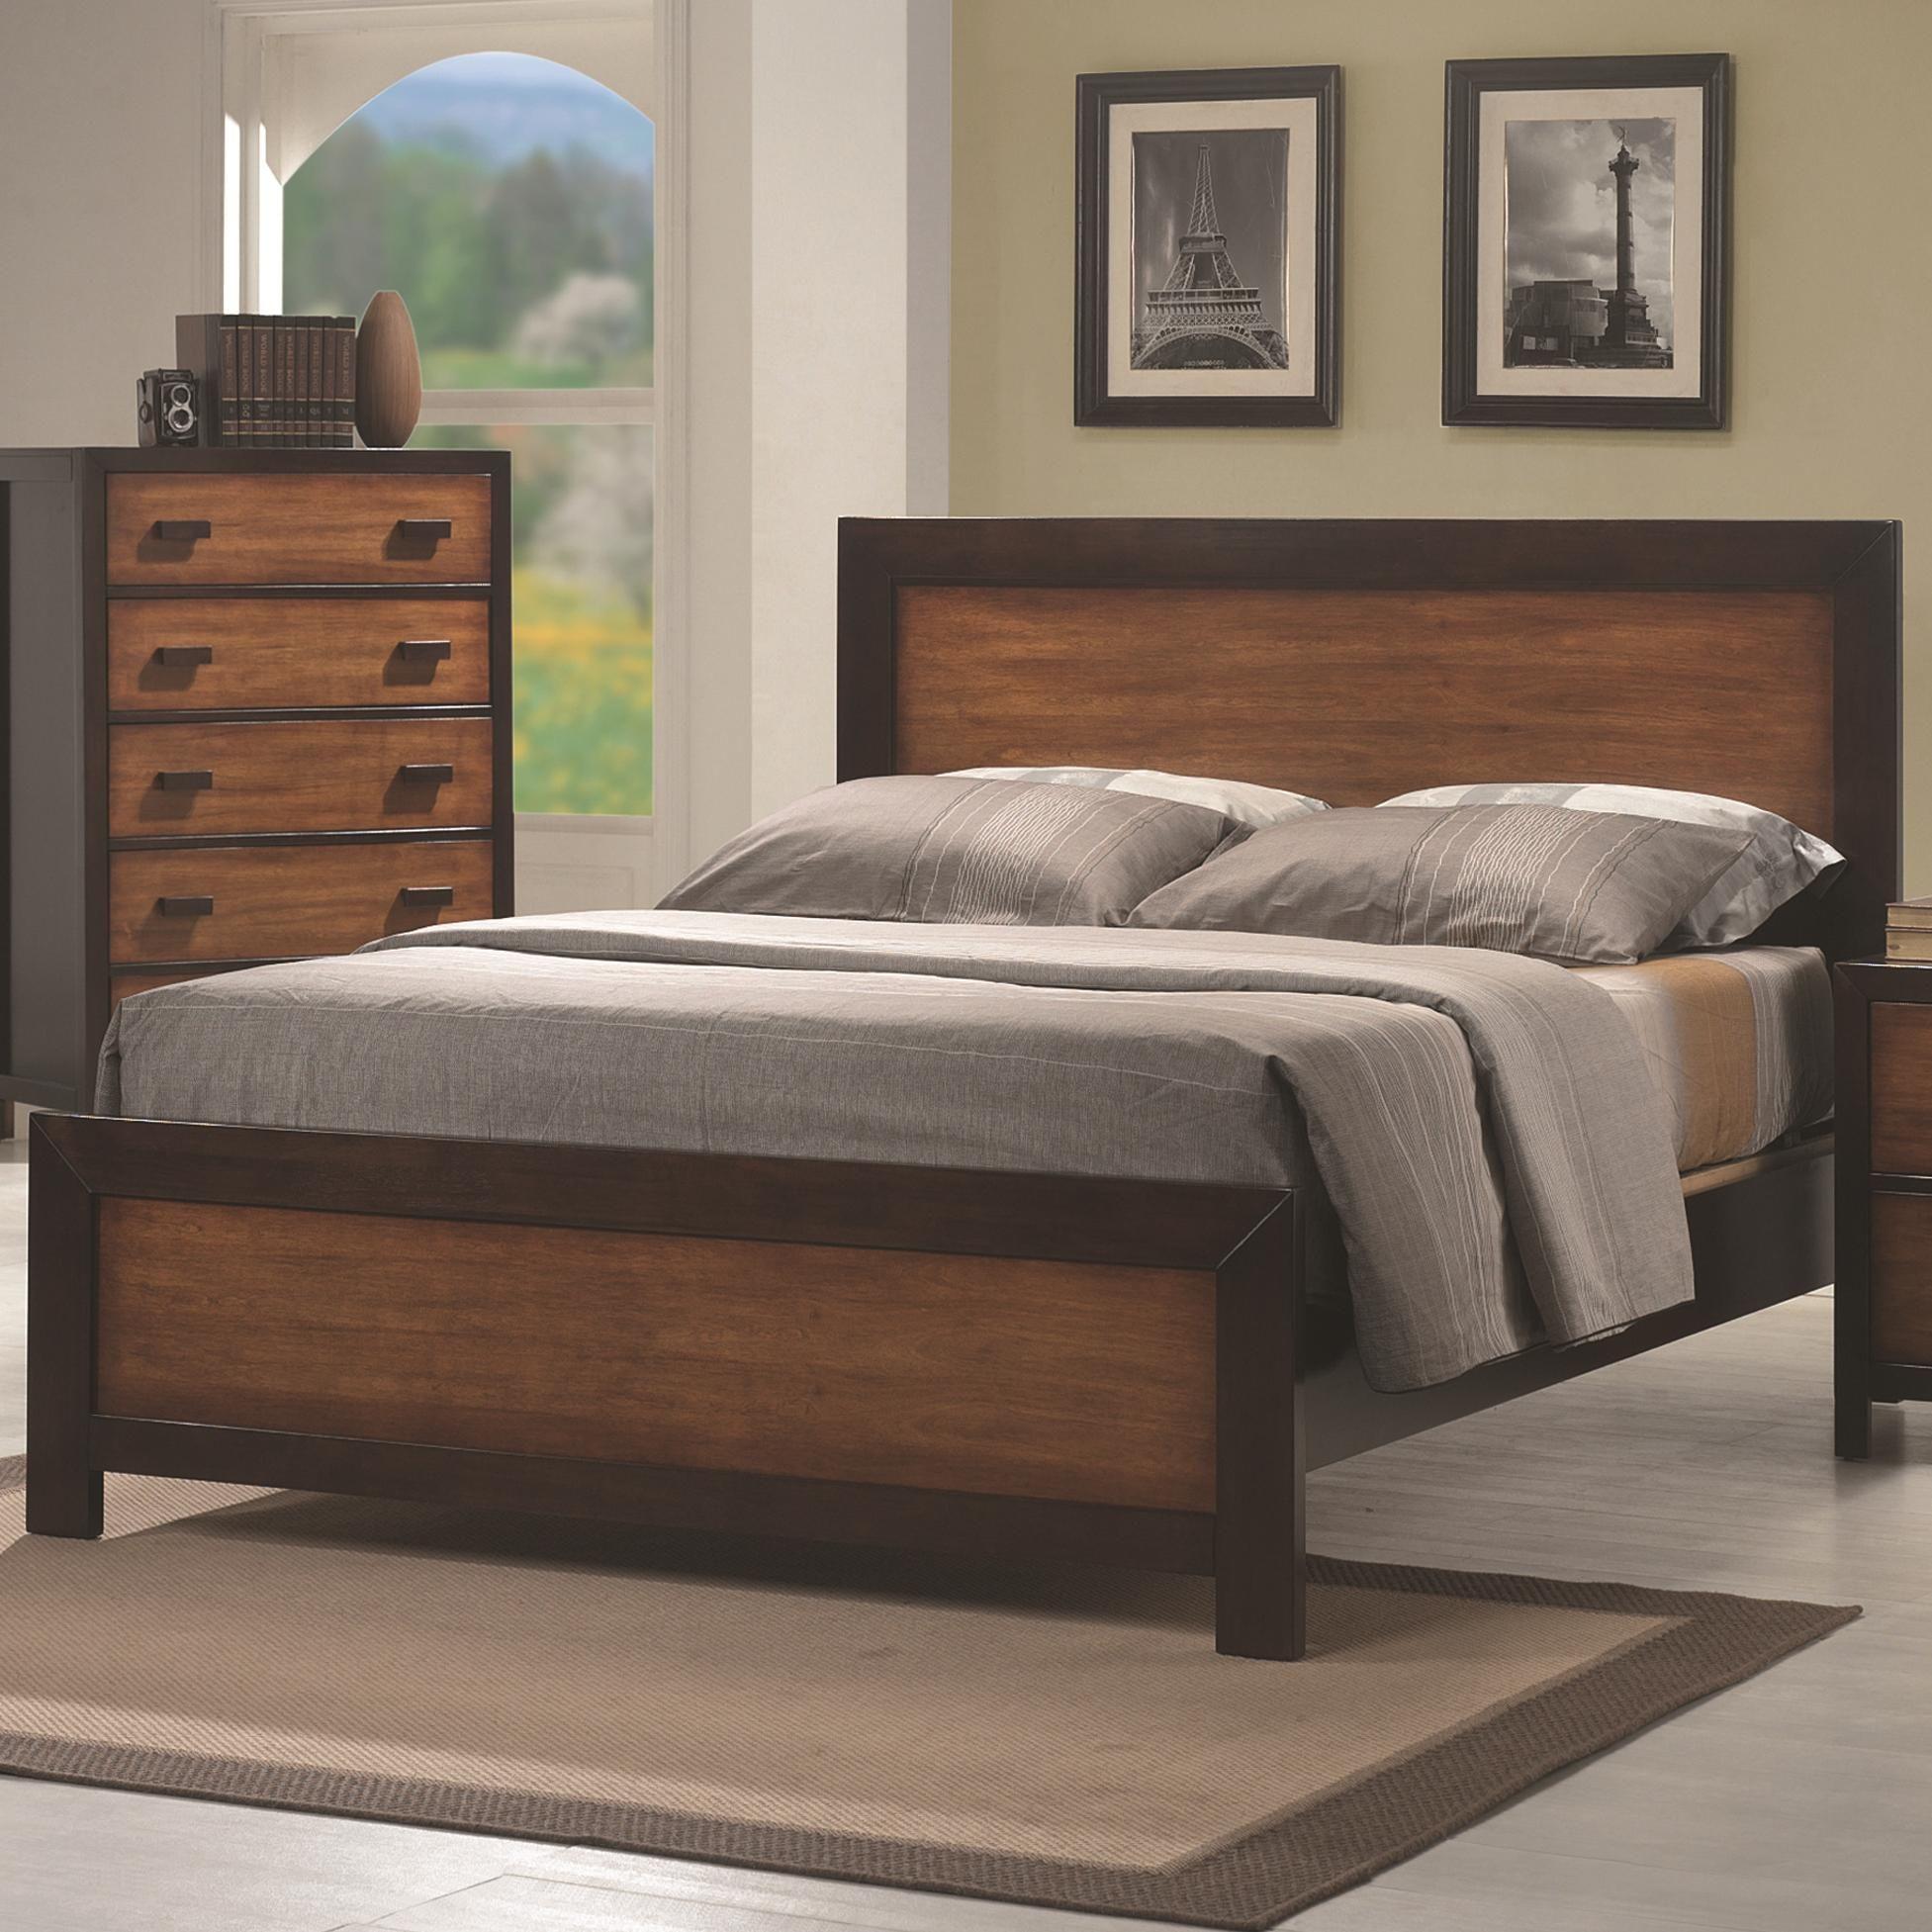 Coral King Headboard Bed by Coaster  Retro bedroom furniture, Oak